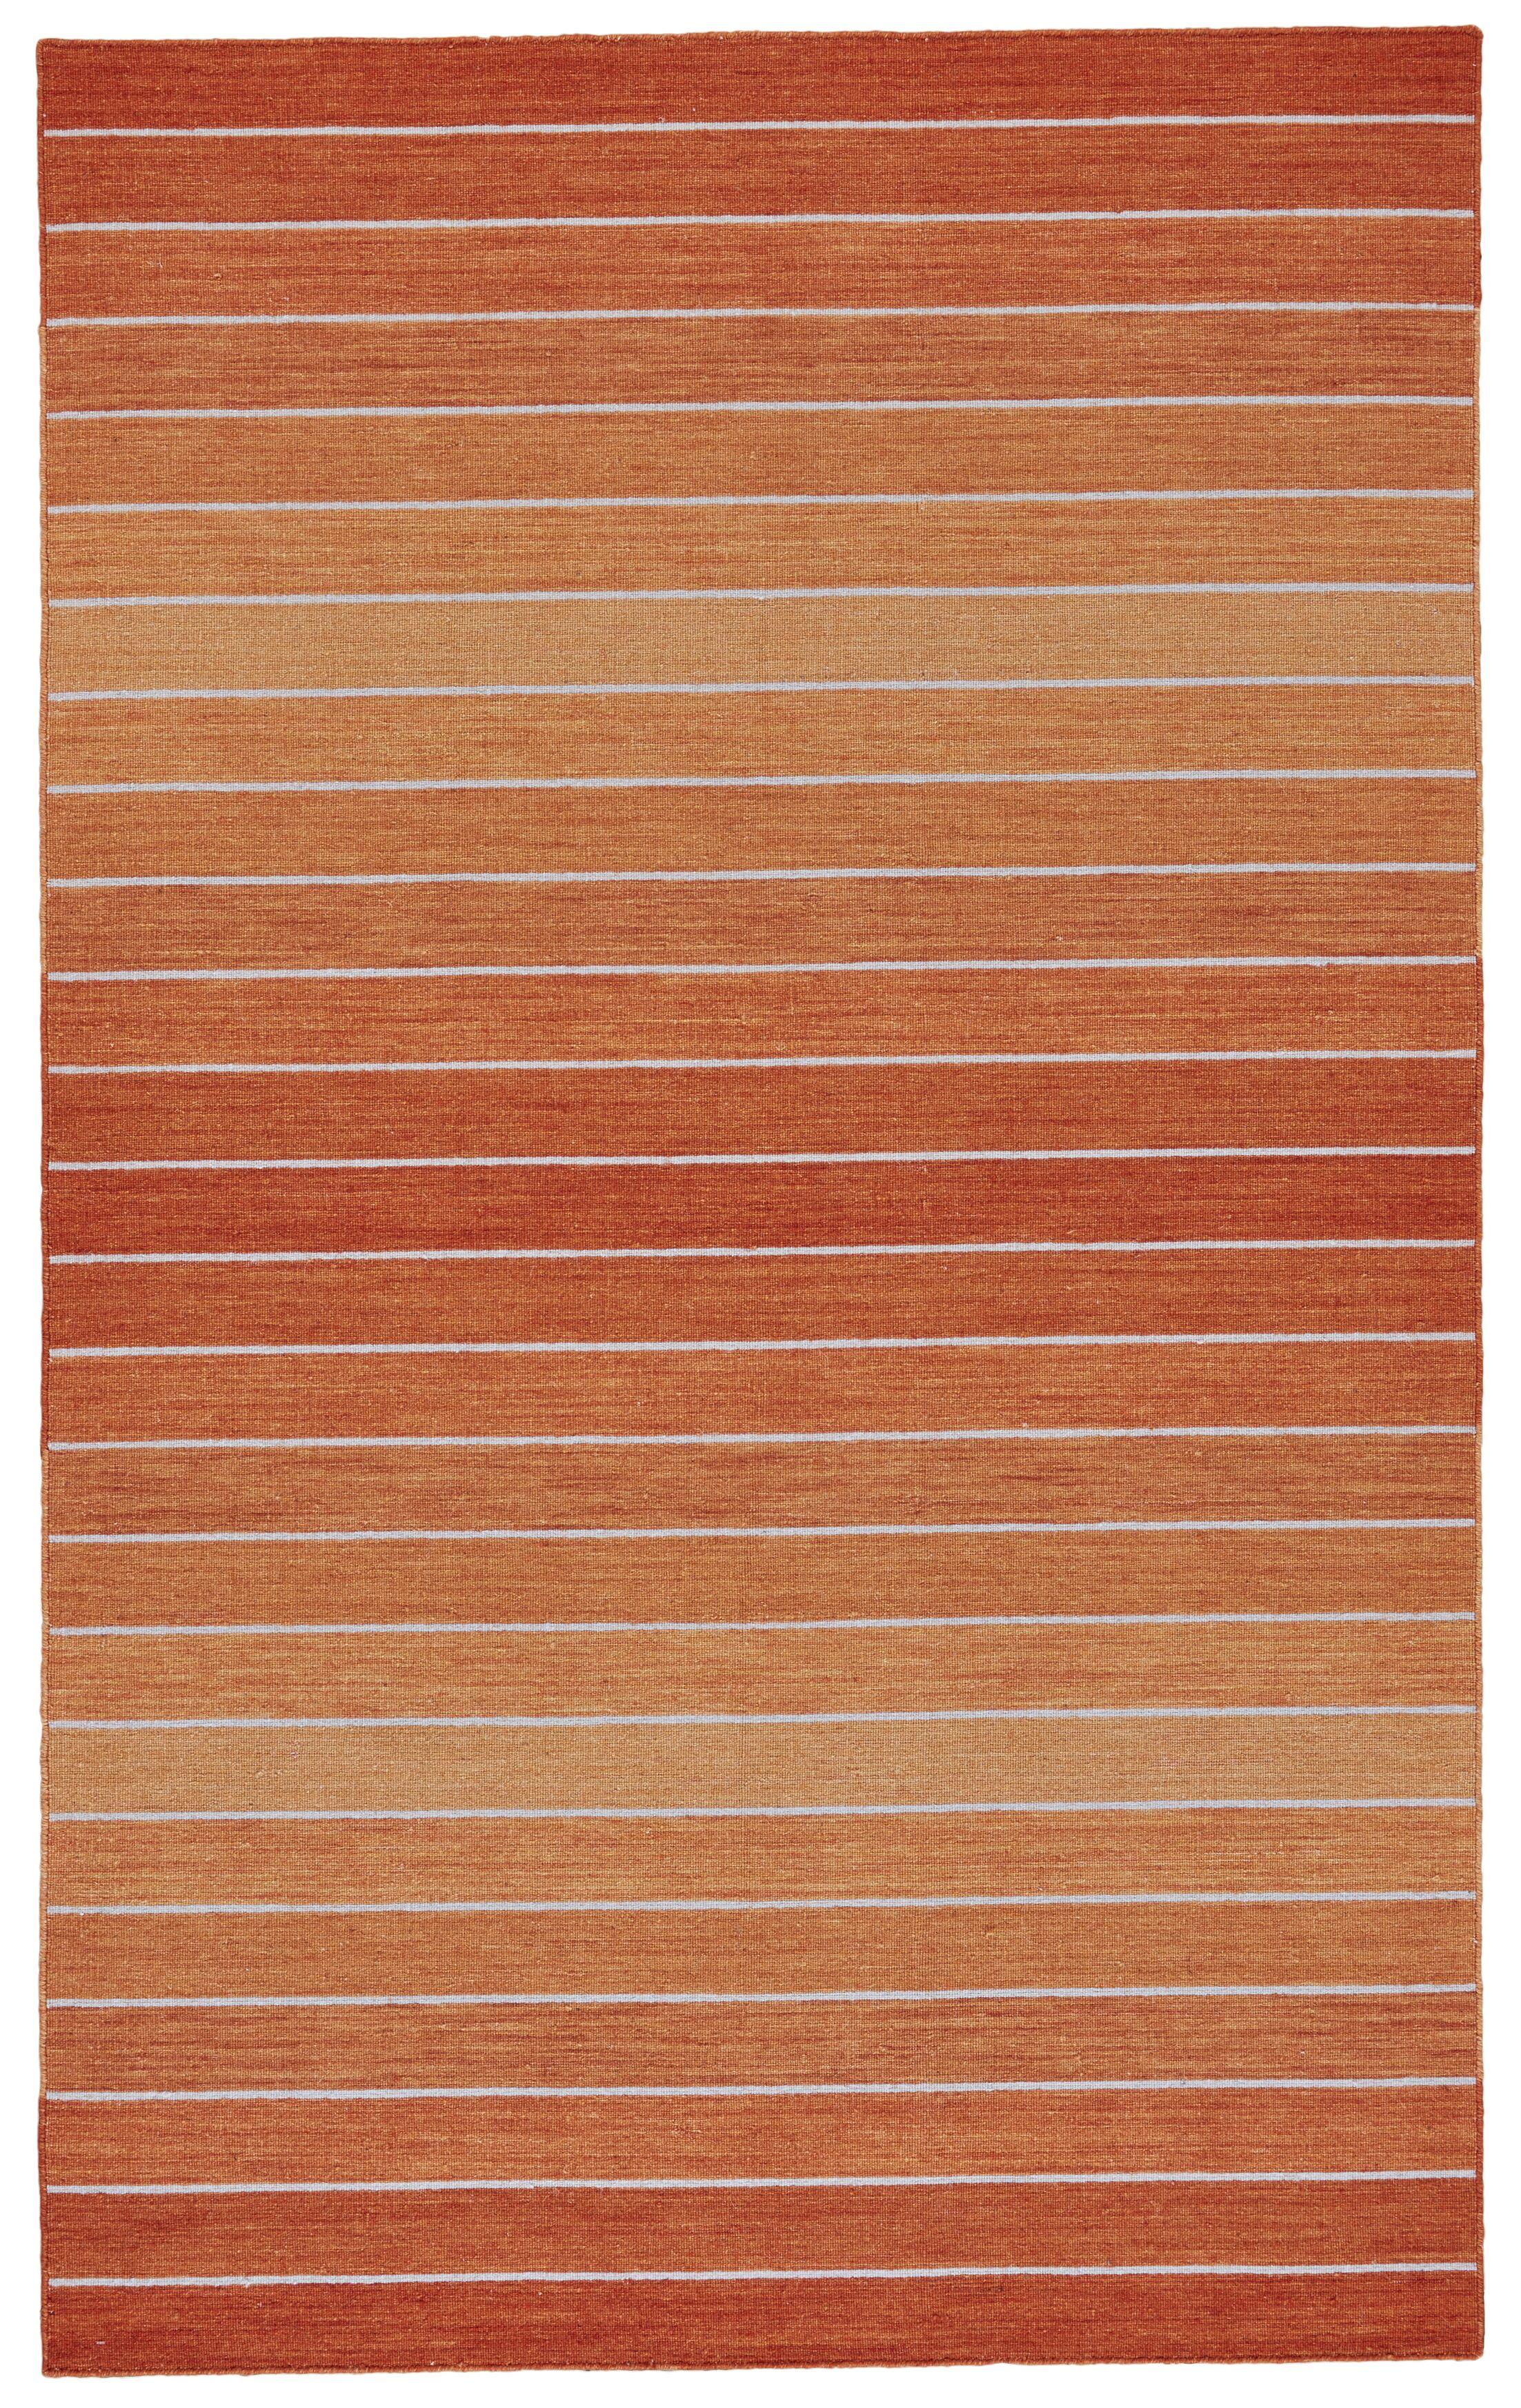 Mcdonald Hand-Loomed Orange Area Rug Rug Size: Runner 2'6